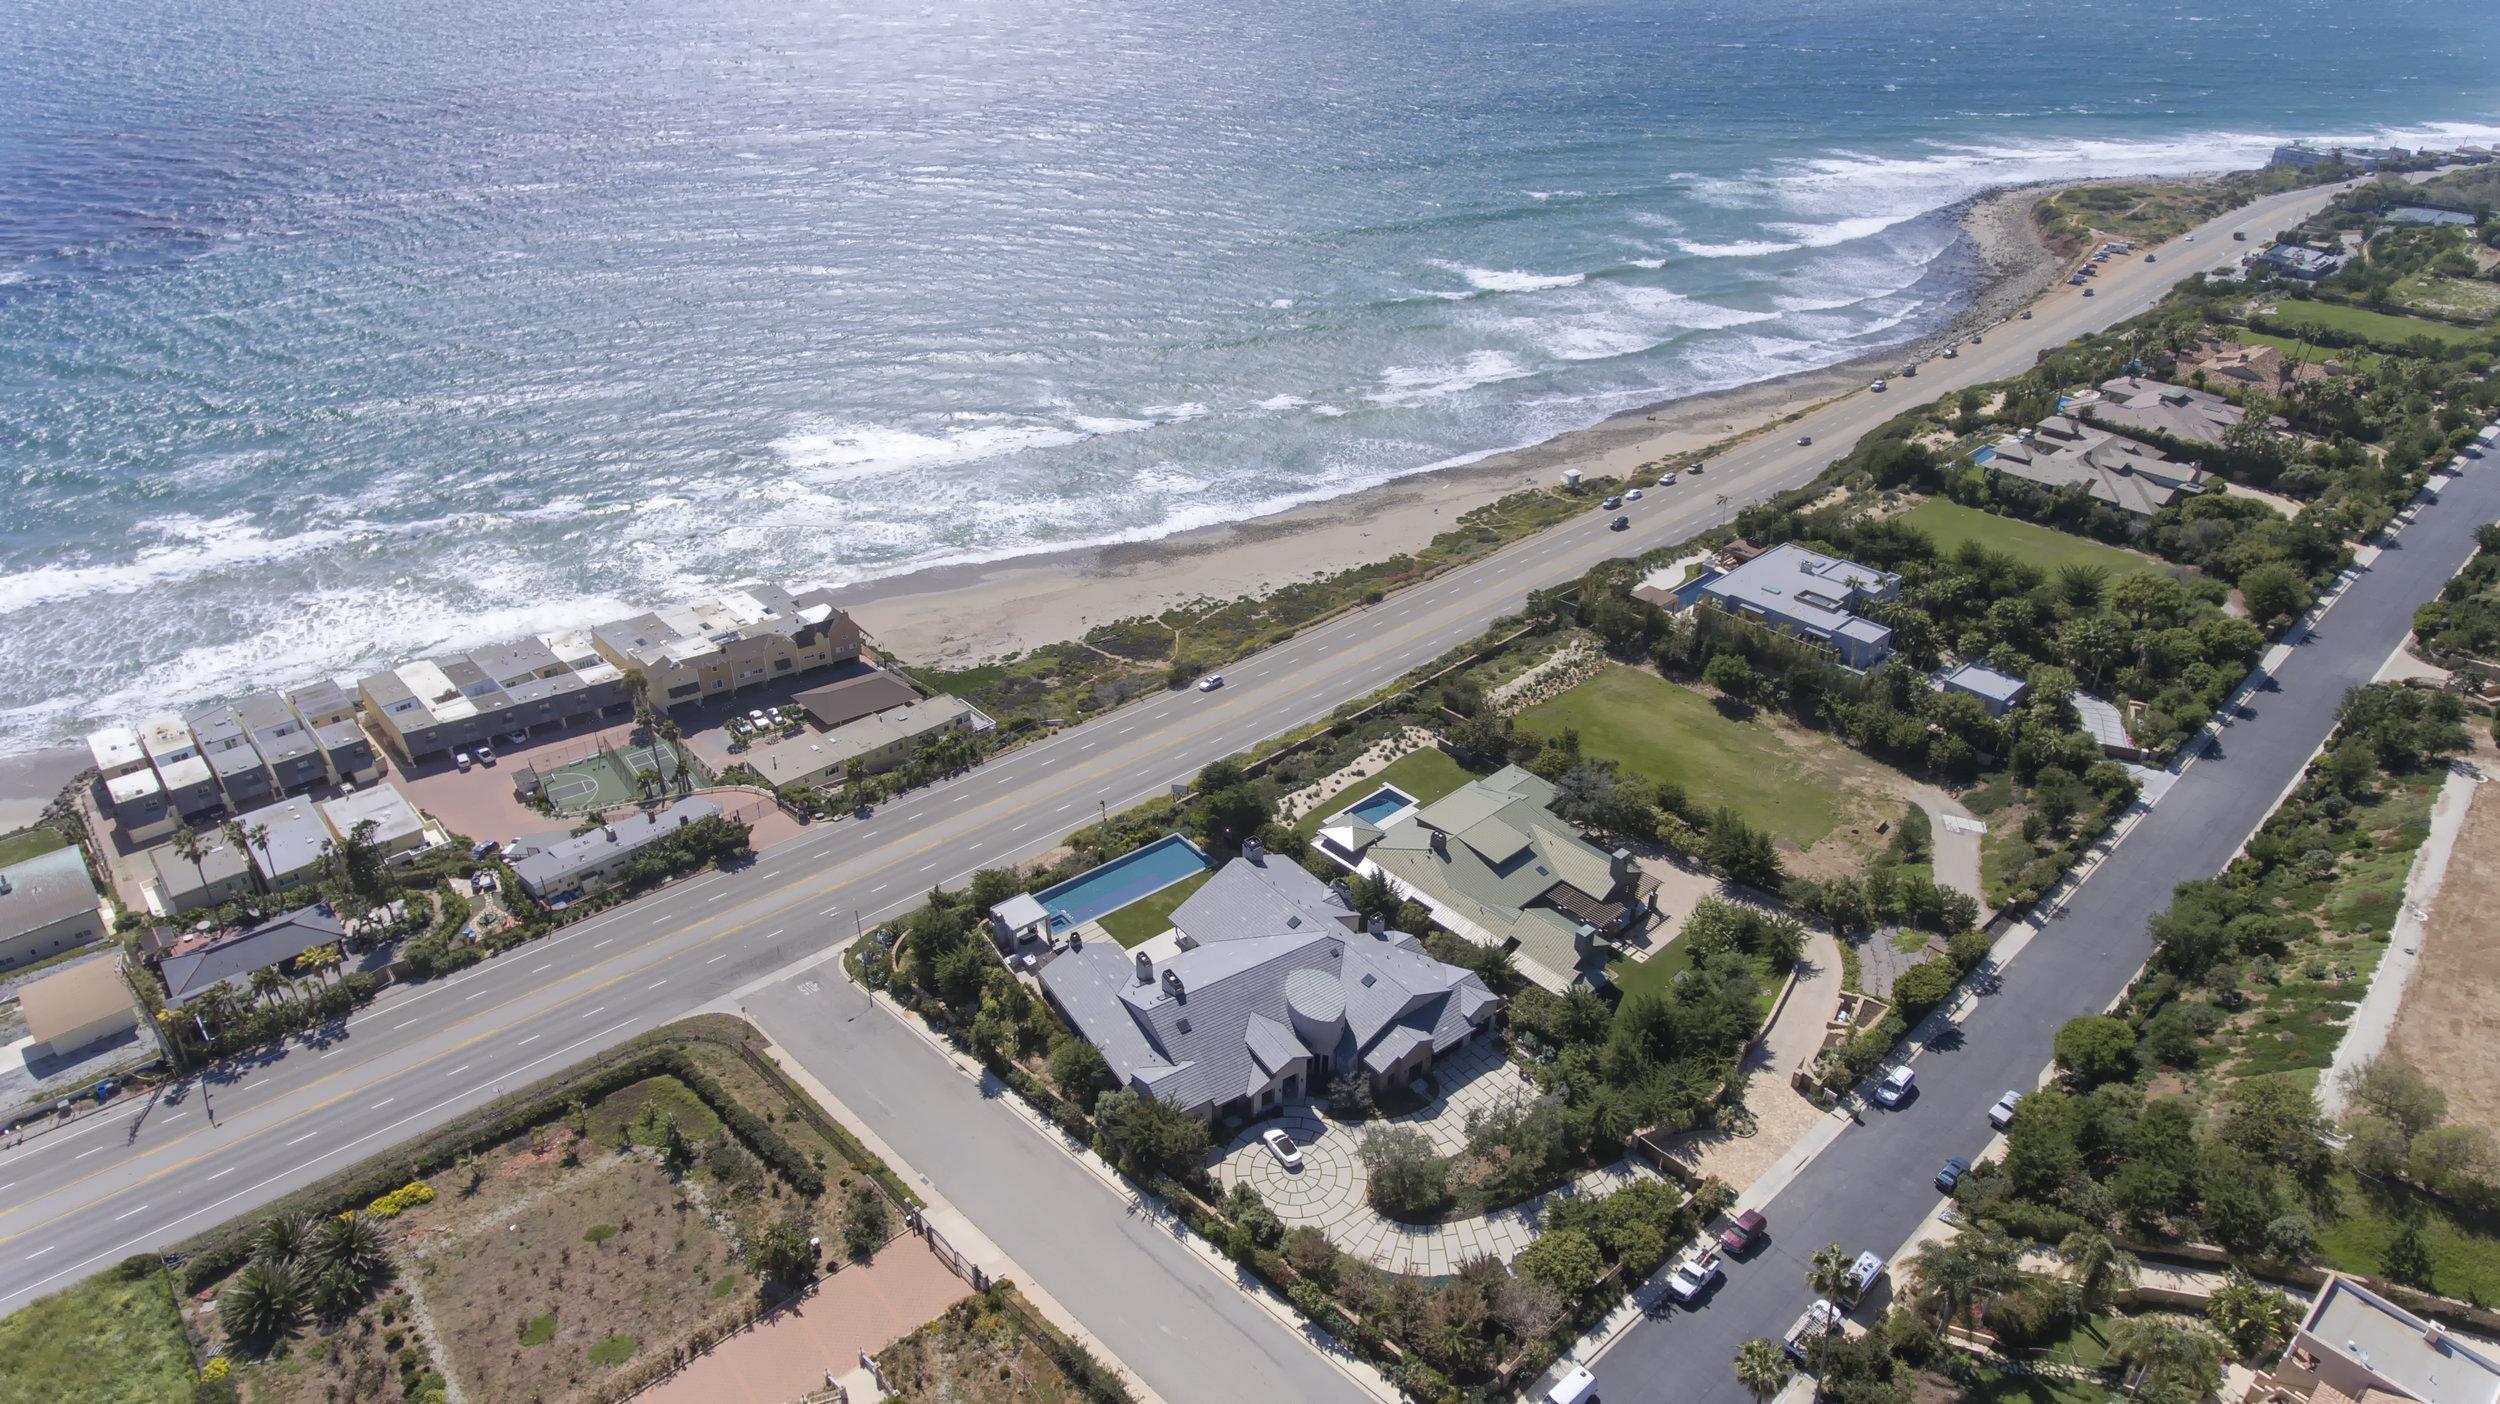 029 front aerial 2 11902 Ellice Street Malibu For Sale The Malibu Life Team Luxury Real Estate.jpg